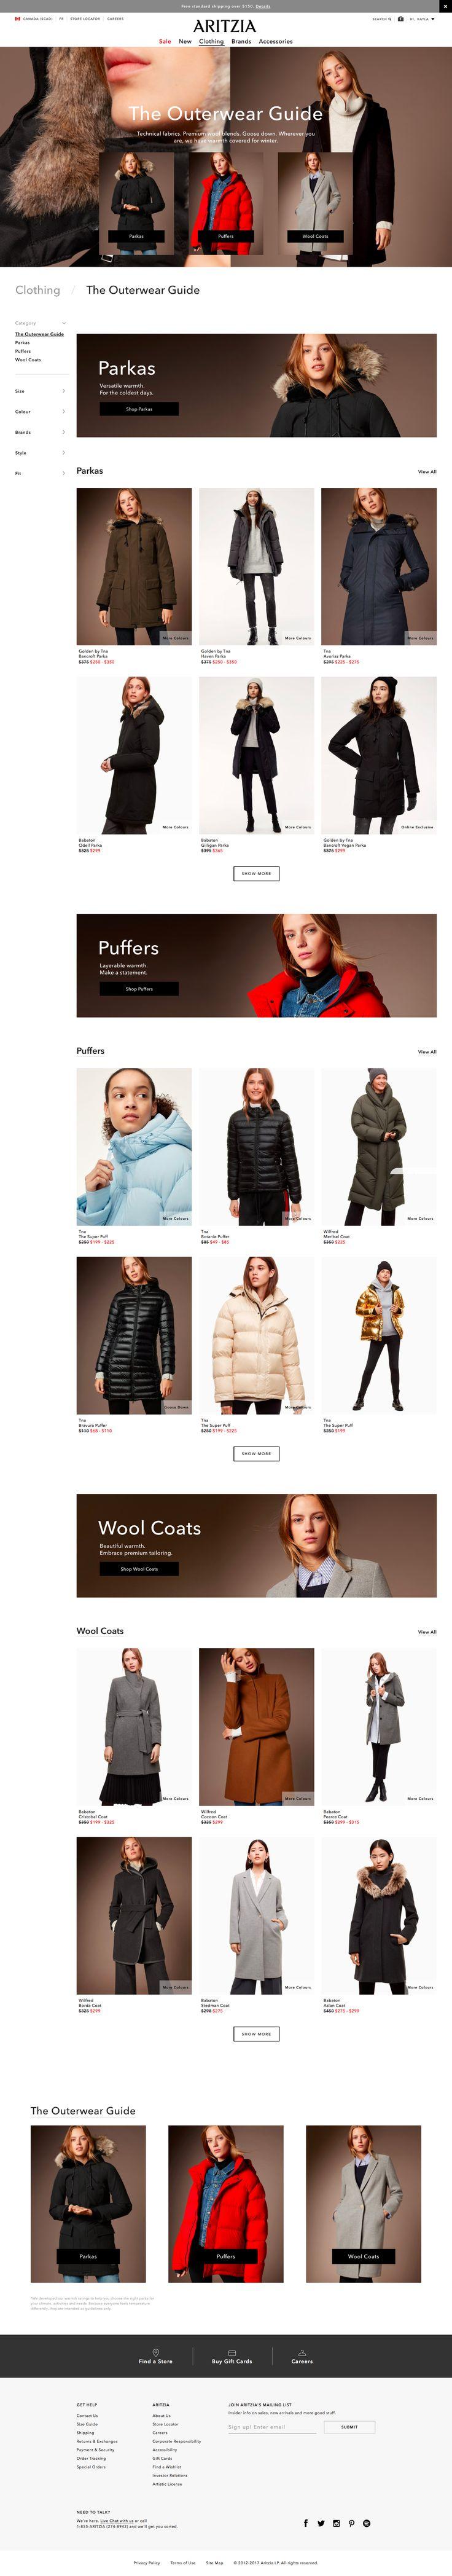 aritzia outerwear guide